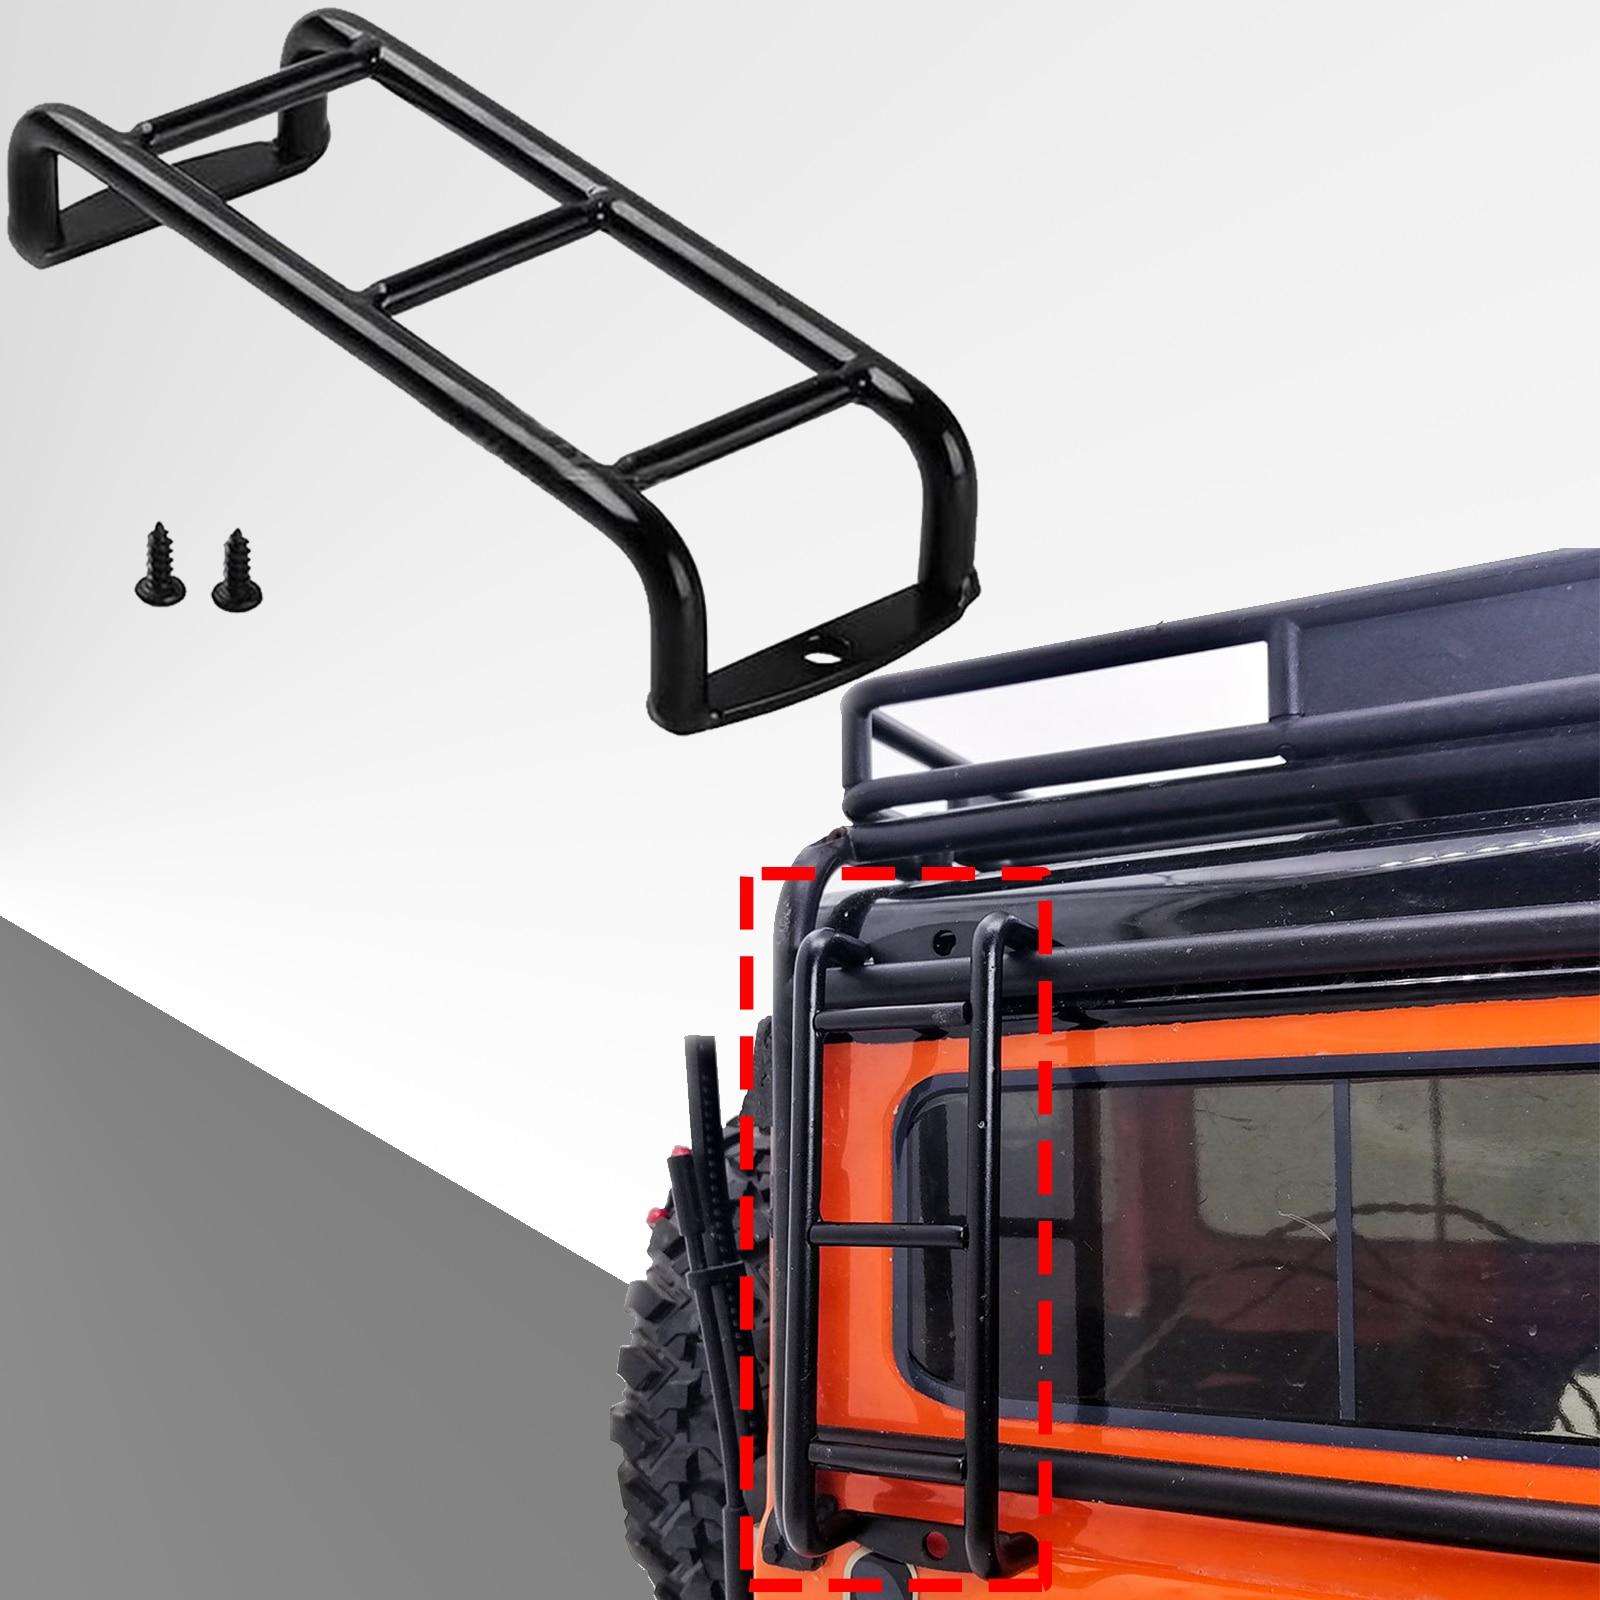 1 PCS Black Car Metal Mini Ladder Stairs Accessories For Traxxas TRX4 TRX-4 Bronco SCX10 90046 90047 D90 1/10 RC Crawler metal front bumper for traxxas trx 4 trx4 bronco 1 10 rc crawler model car